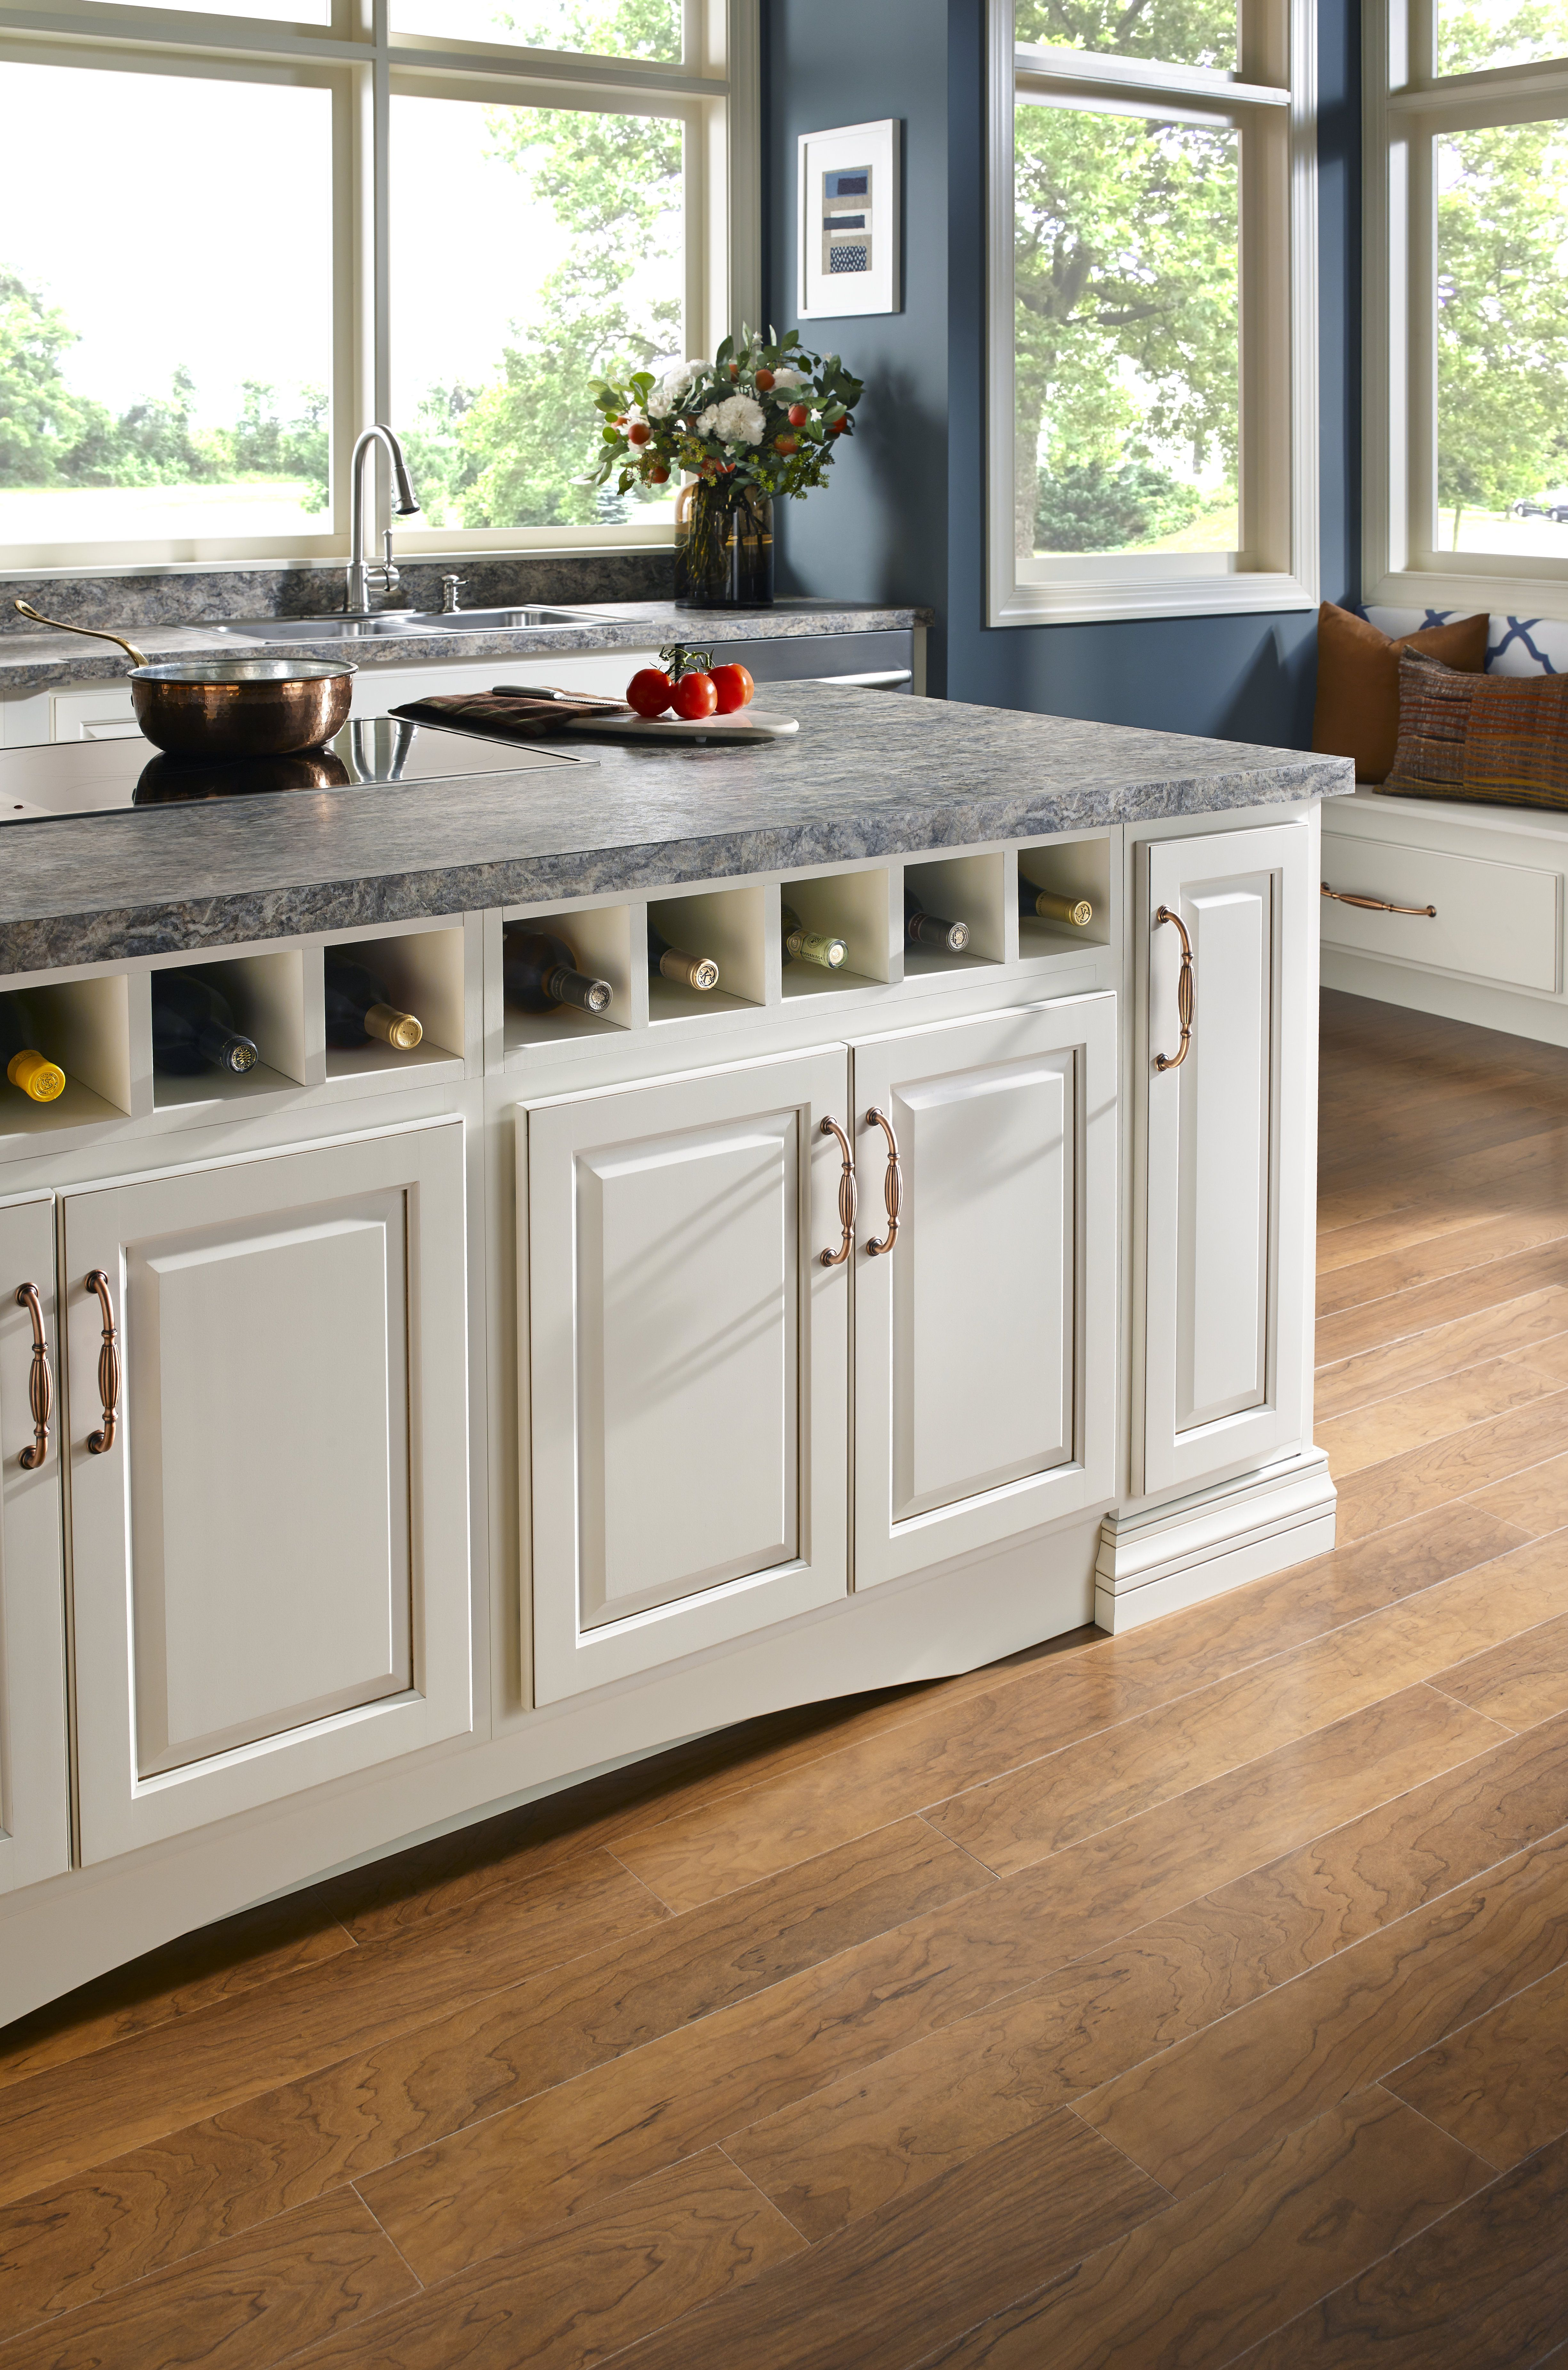 Amerock Allison In New Brushed Copper Decorative Cabinet Hardware